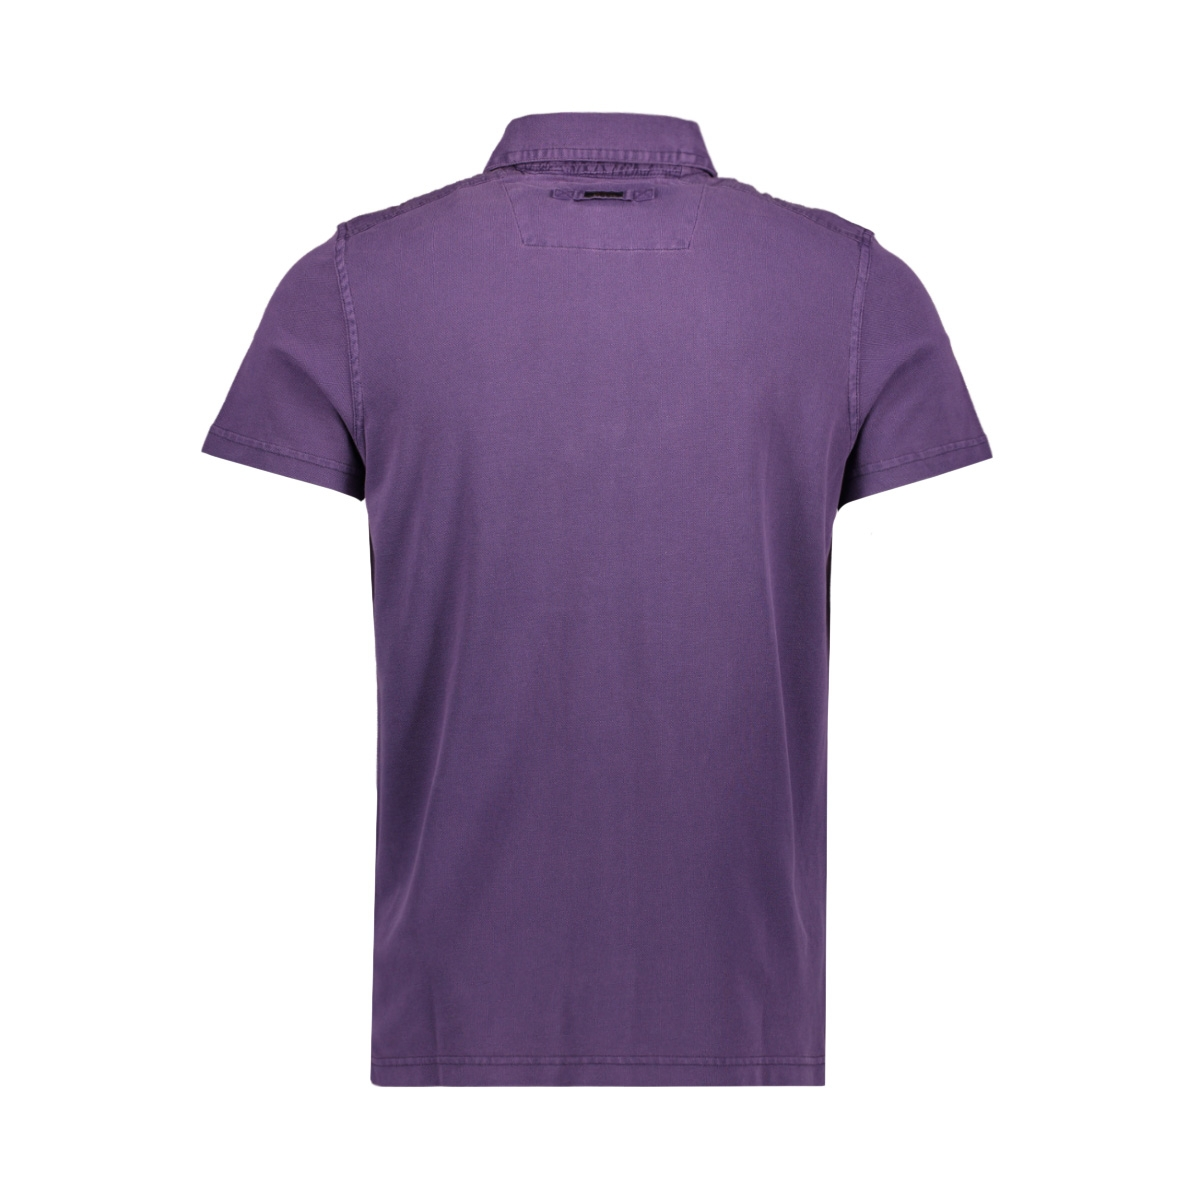 short sleeve polo ppss195853 pme legend polo 4159